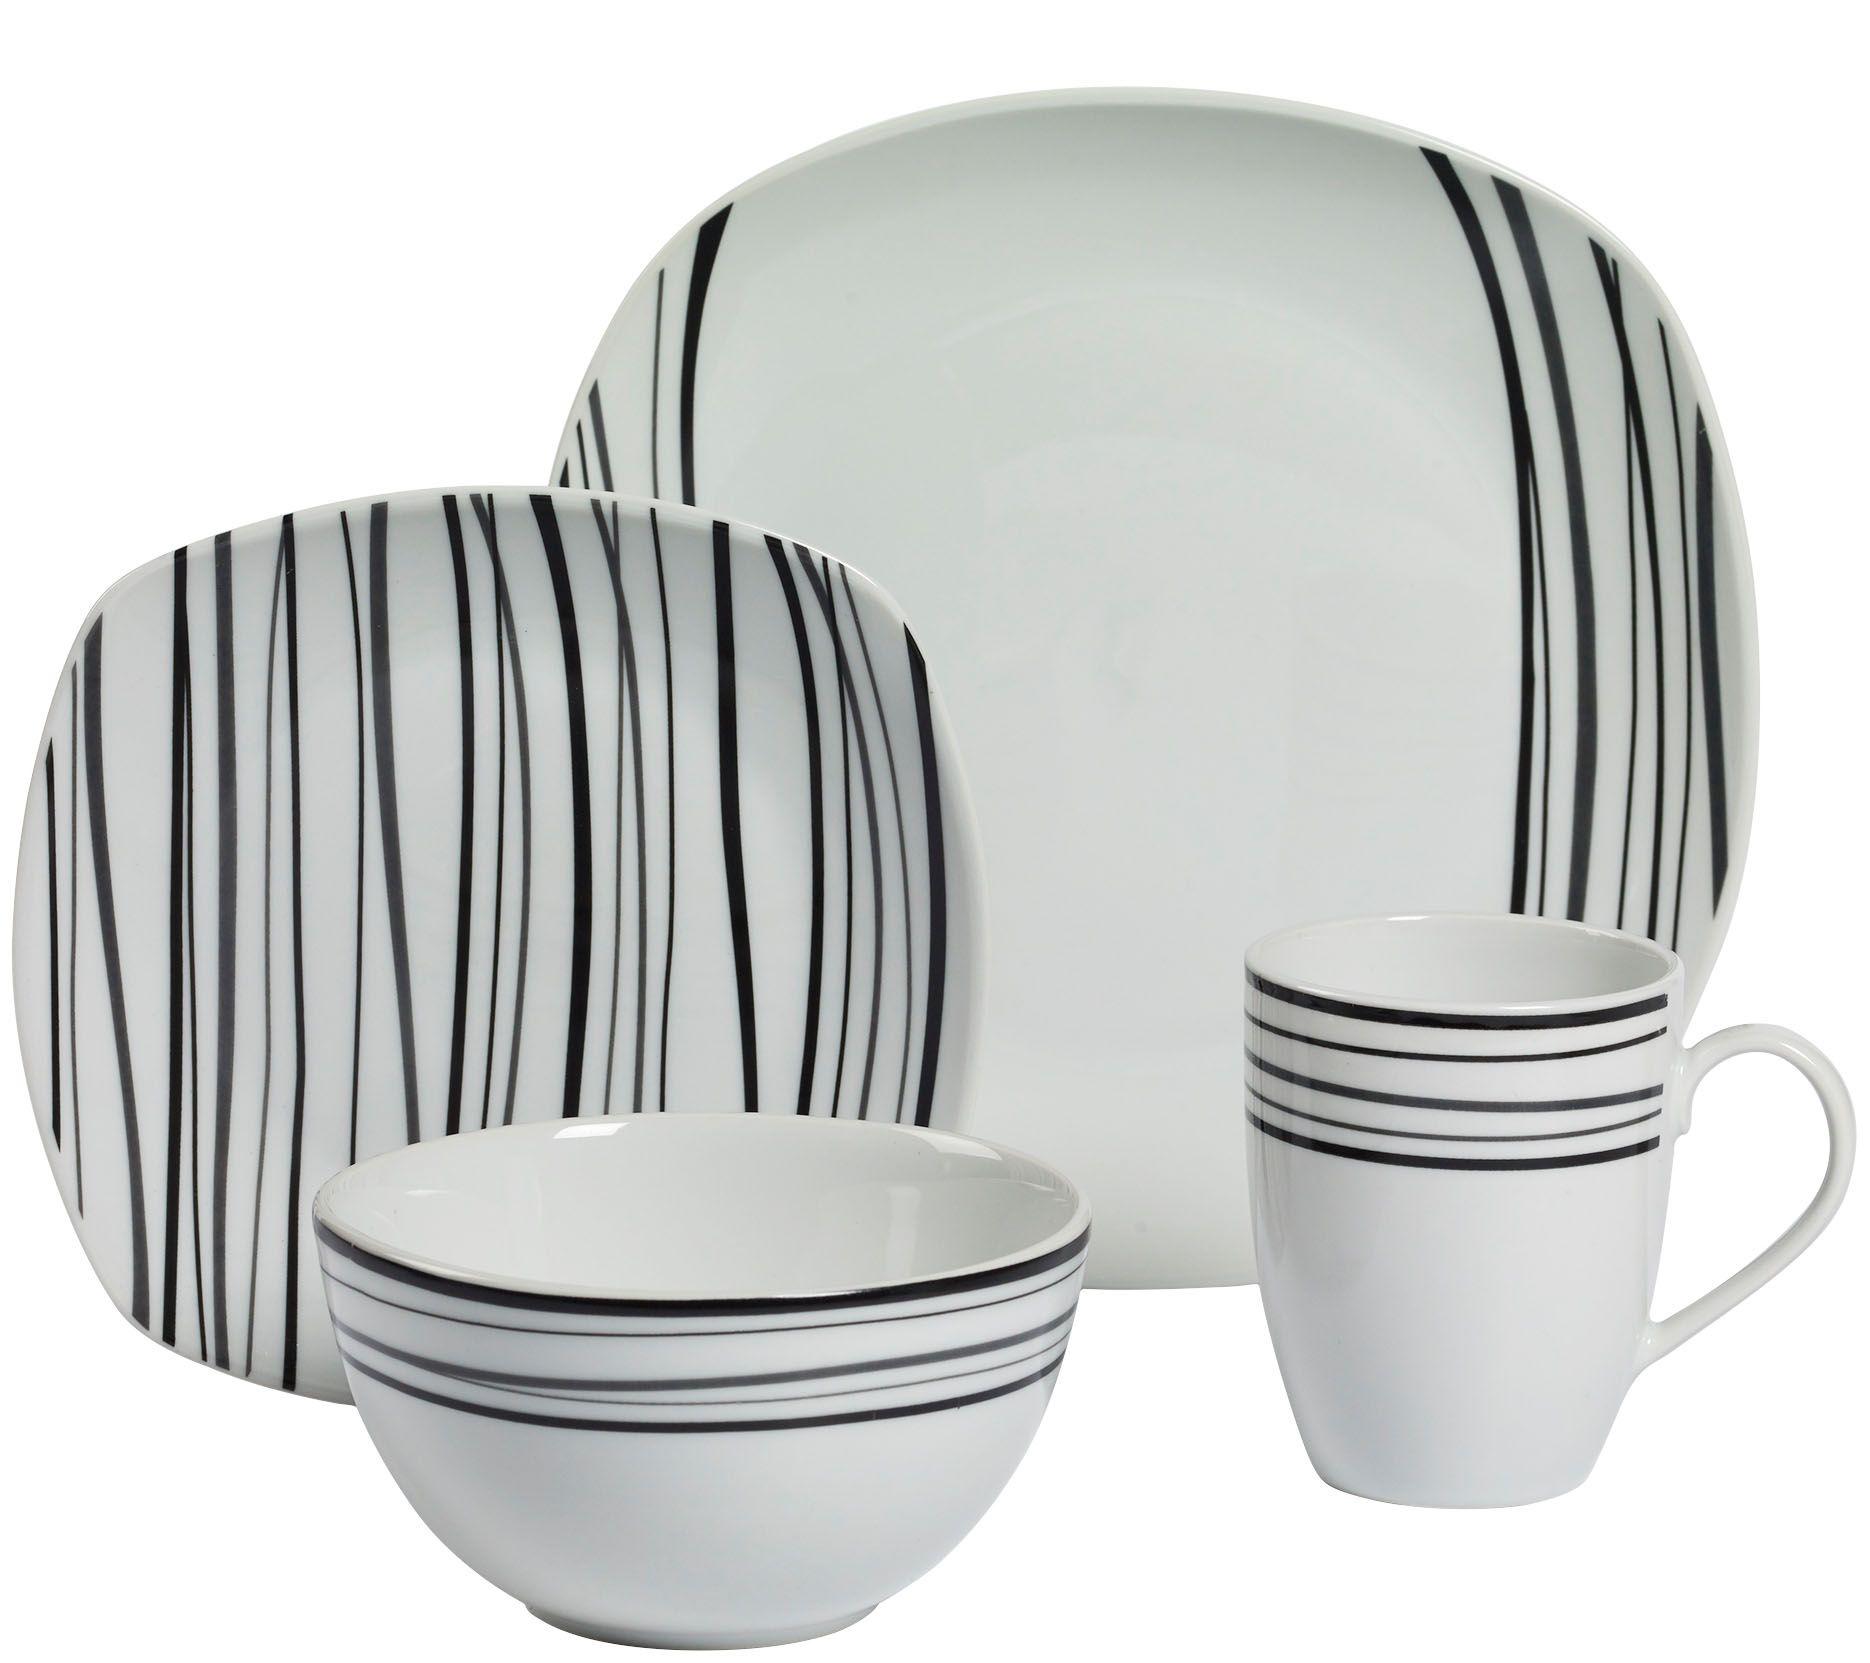 sc 1 st  QVC.com & Tabletops Gallery 16-Piece Dinnerware Set - Justin u2014 QVC.com